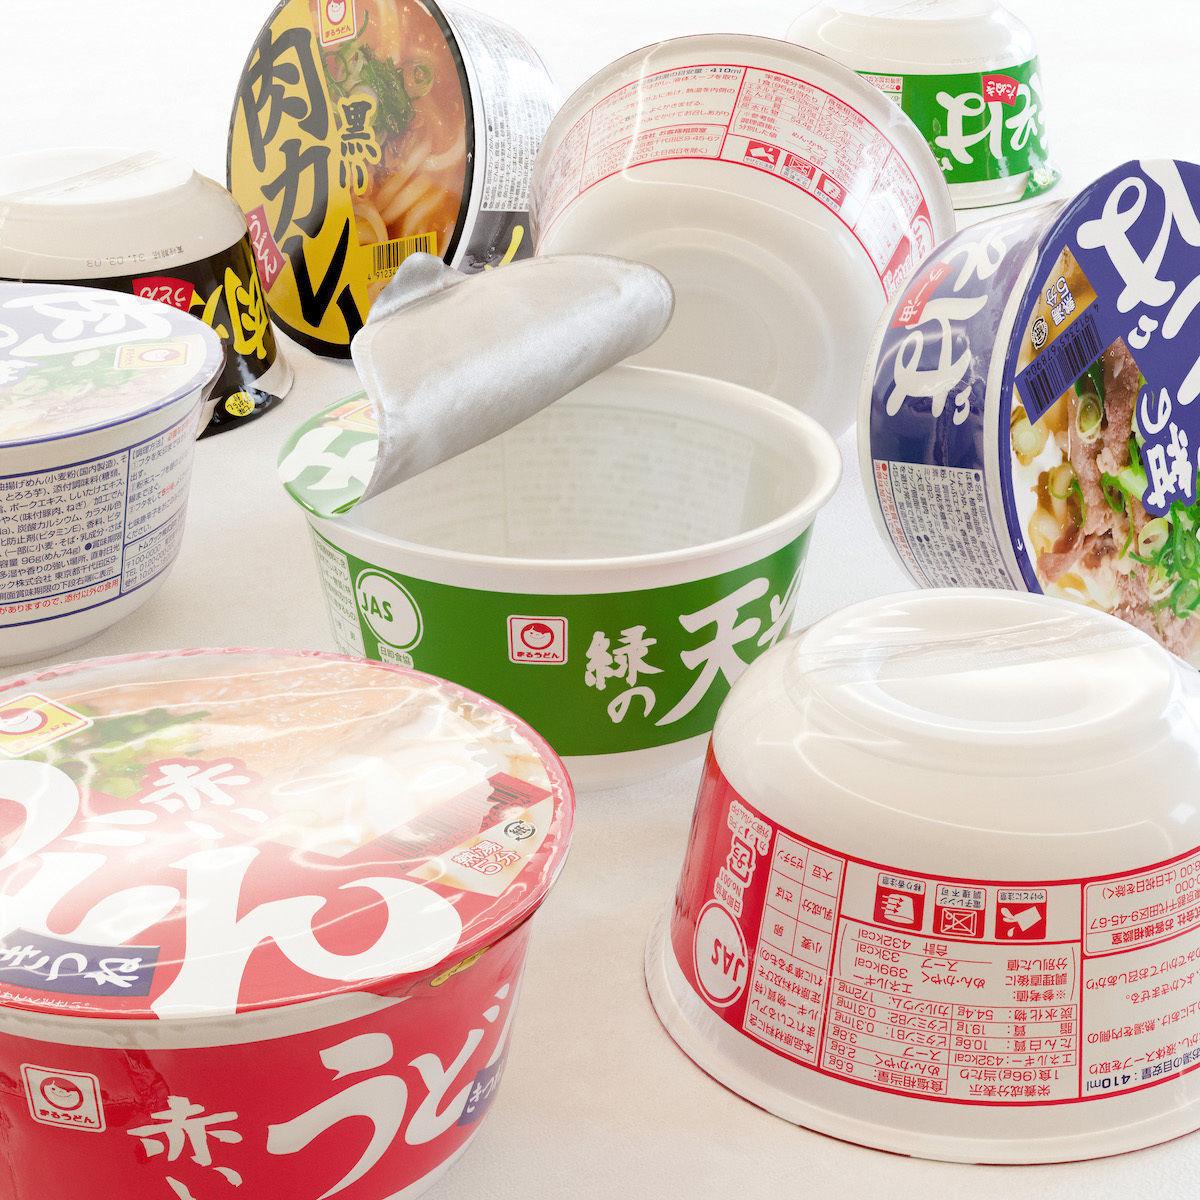 Instant cup noodle - Udon Soba